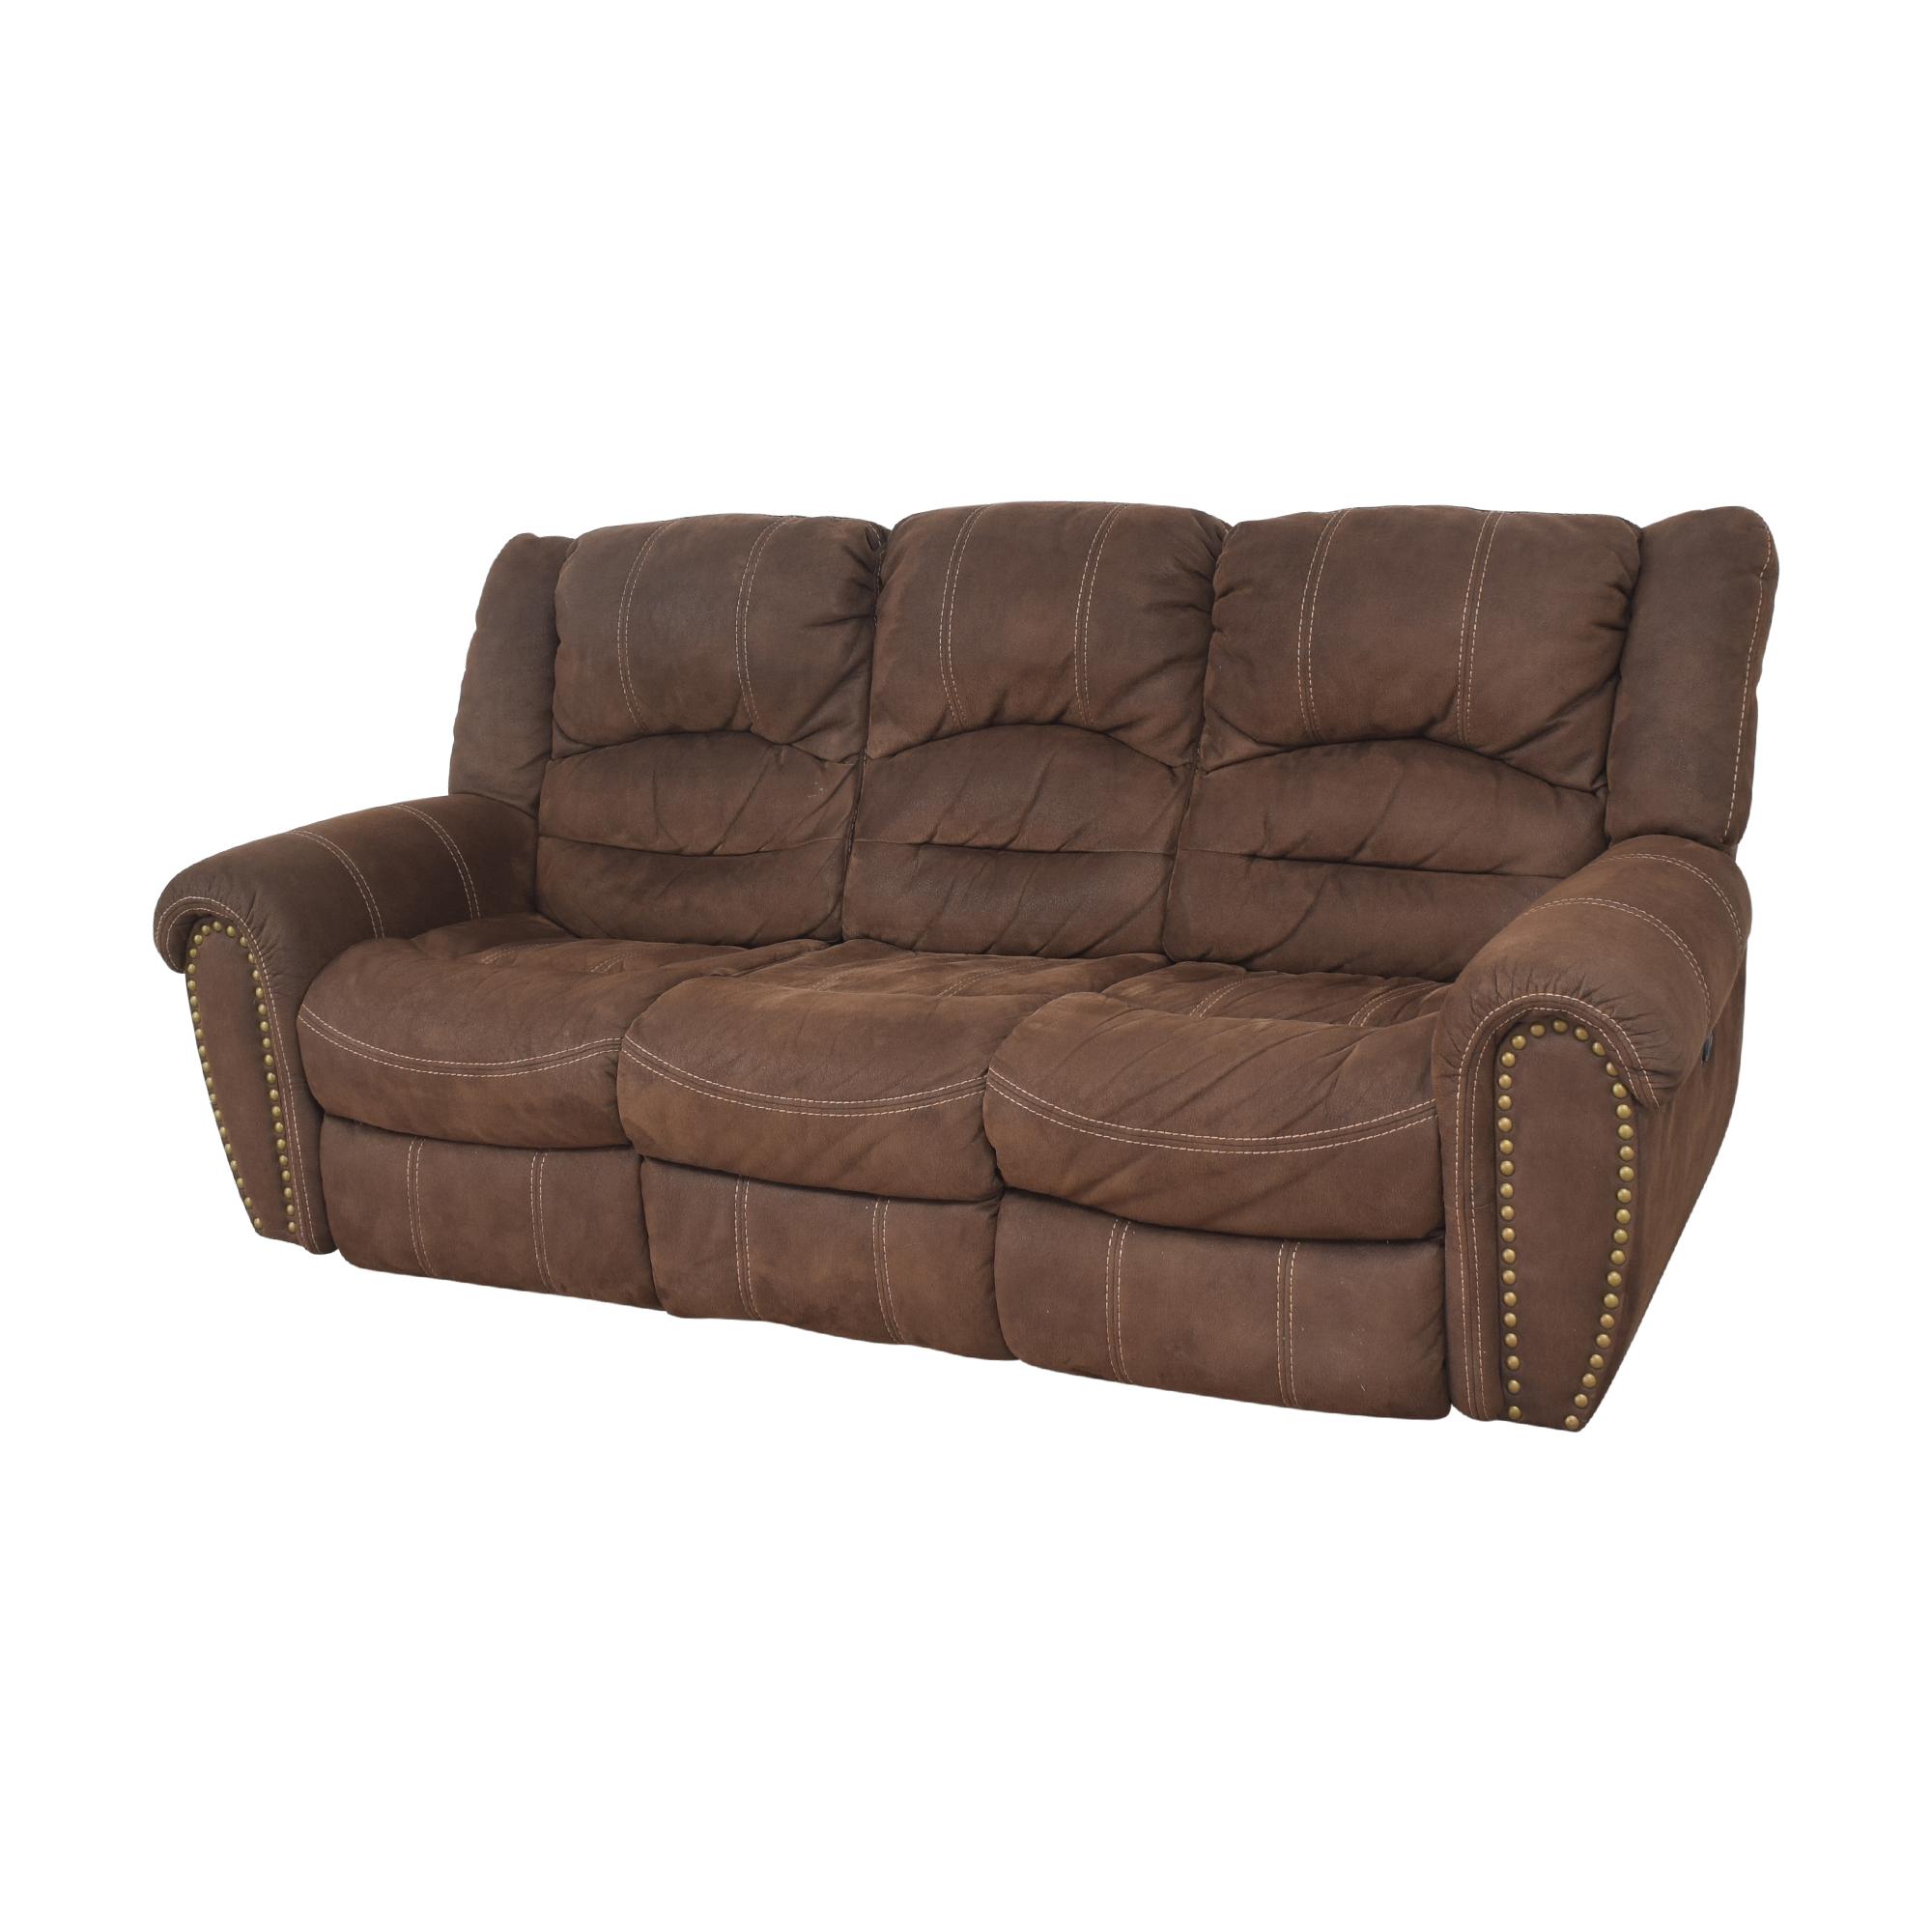 Flexsteel Flexsteel Town Nailhead Reclining Sofa discount